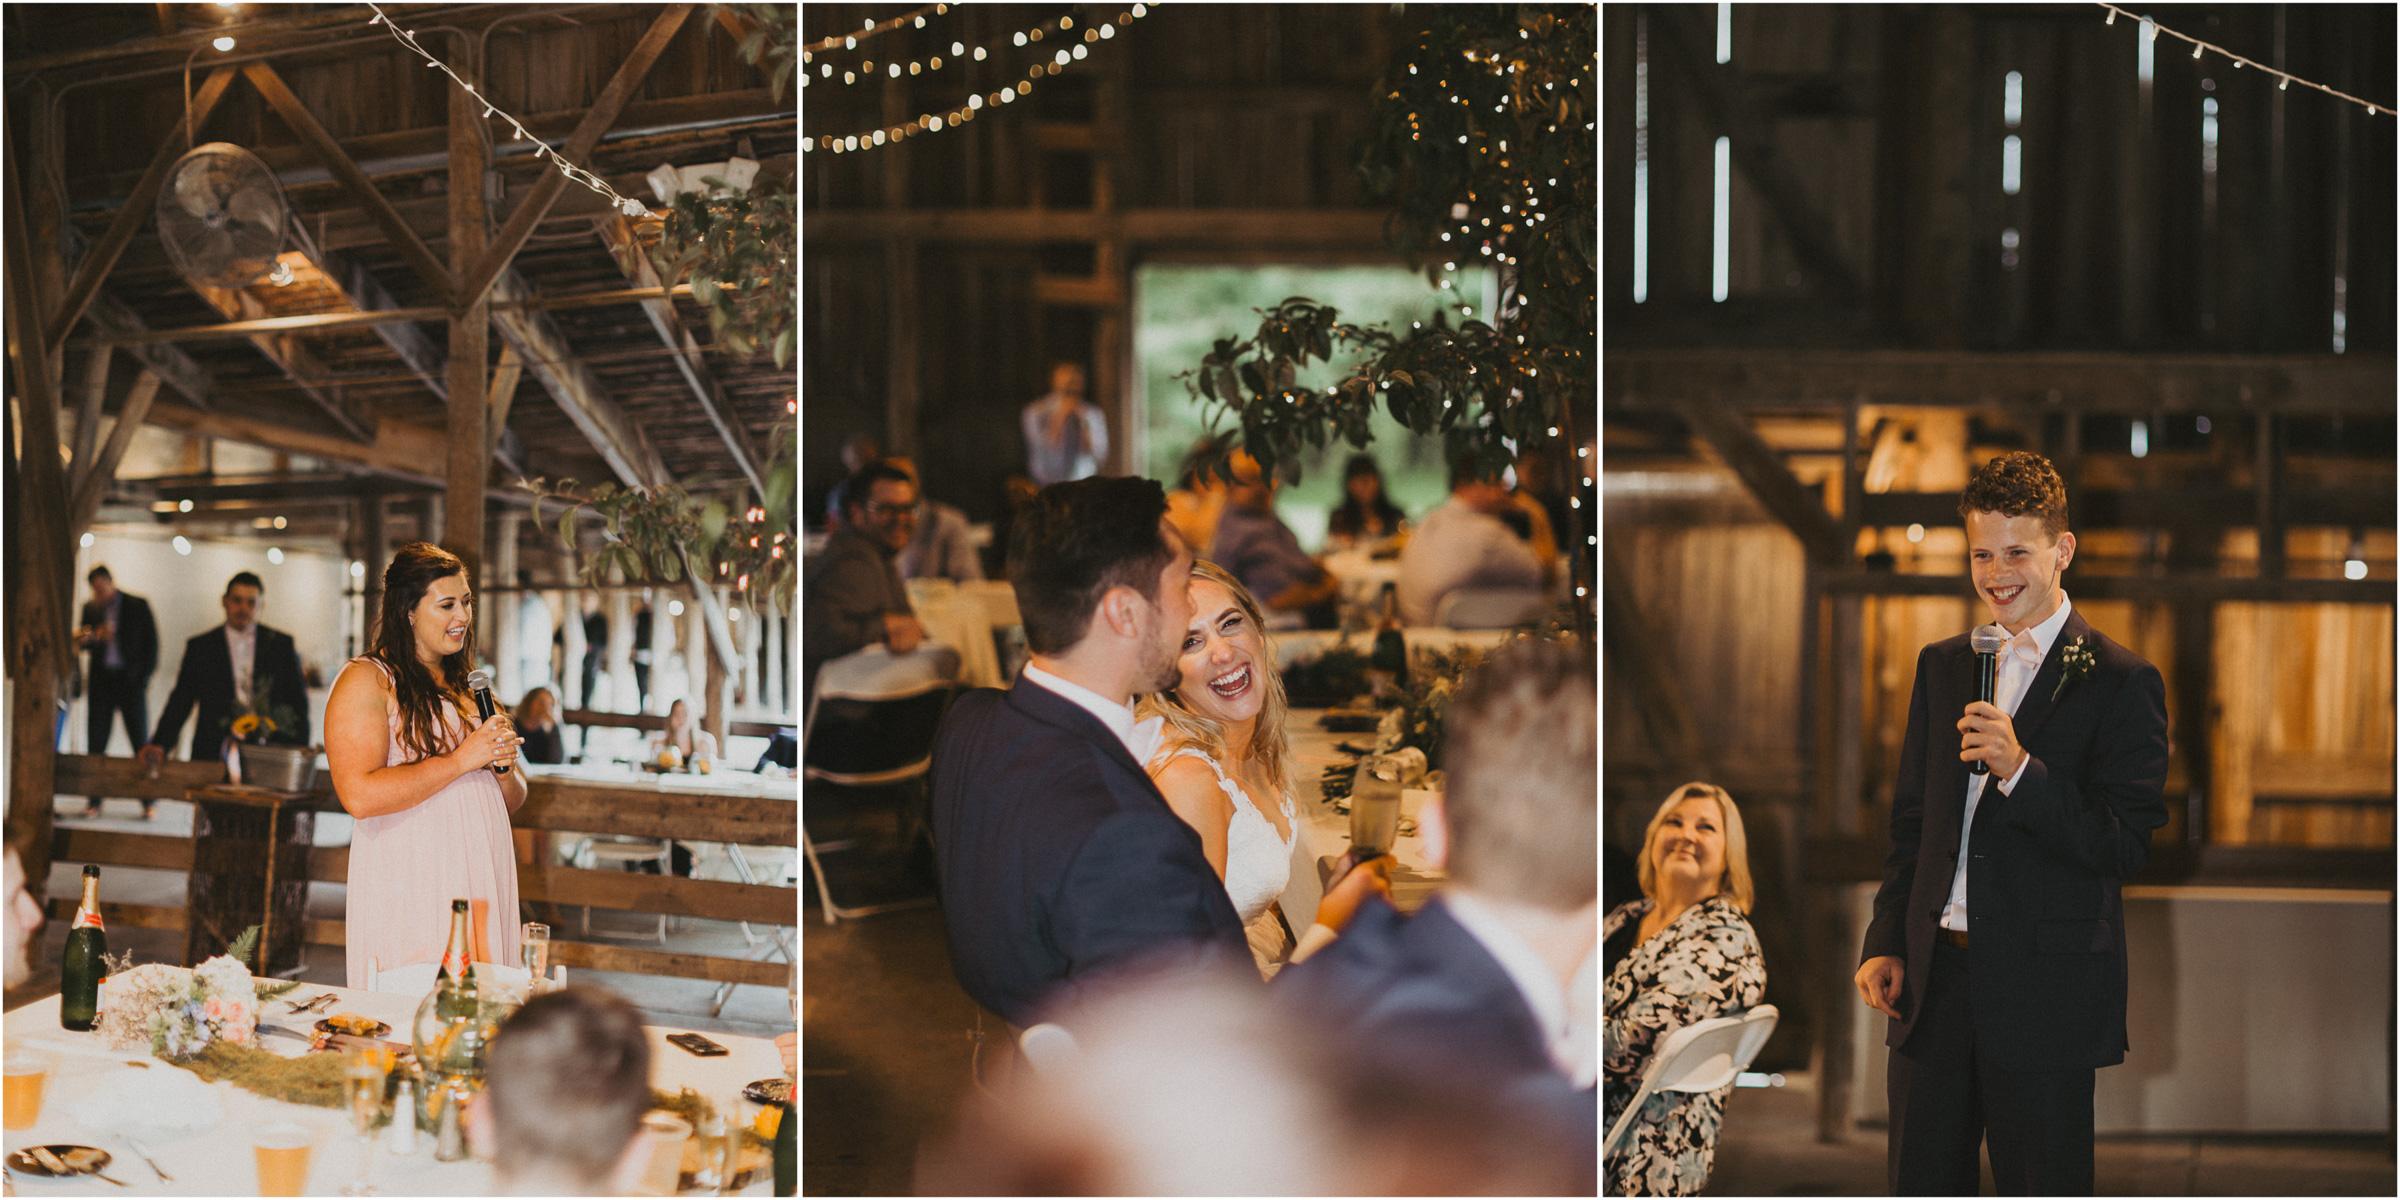 alyssa barletter photography nelson wedding nebraska city lied lodge morton barn spring wedding photographer-55.jpg